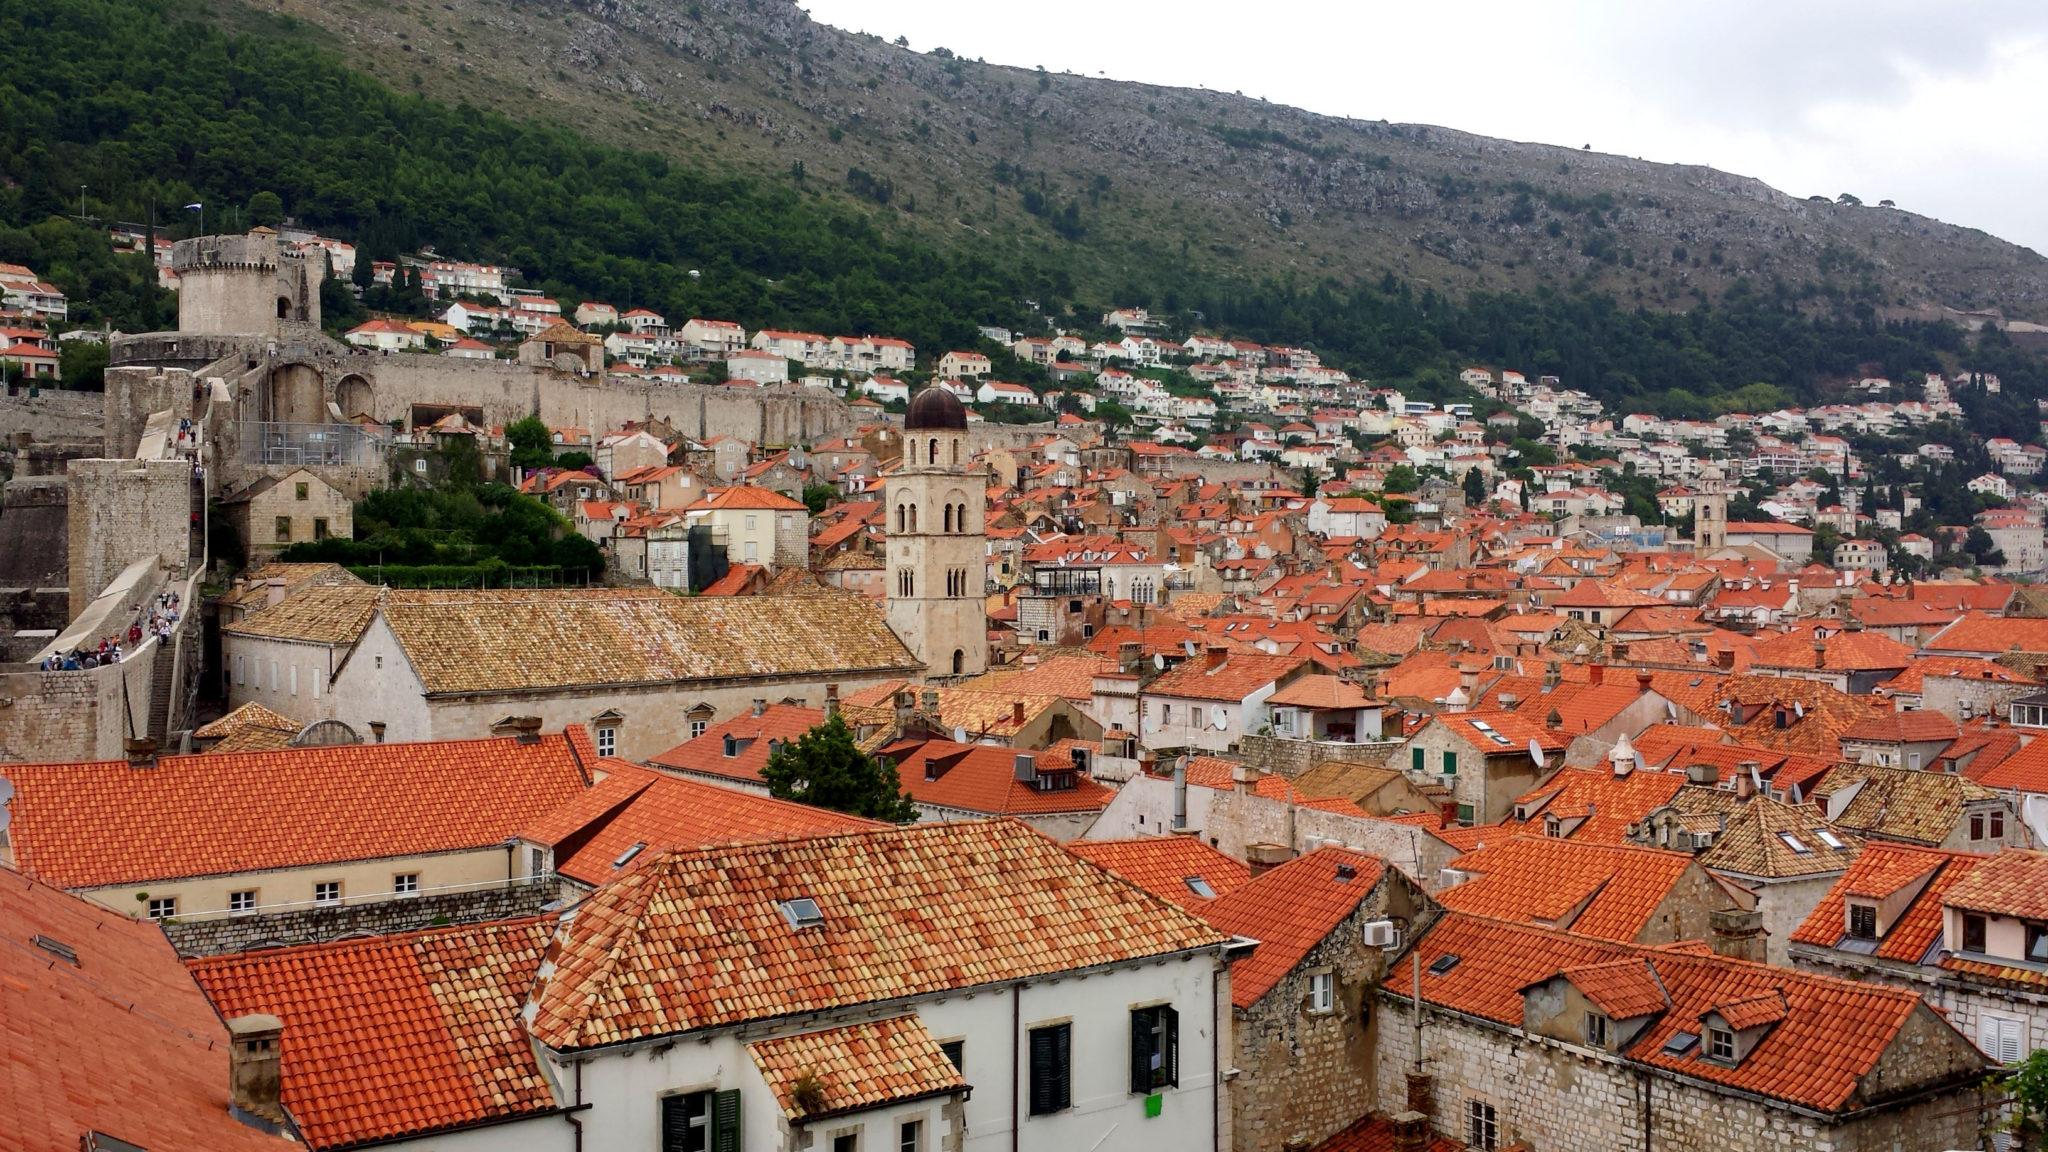 Hema_blog_mode_voyage_croatie_une_journee_a_dubrovnik_vue_sur_la_ville9